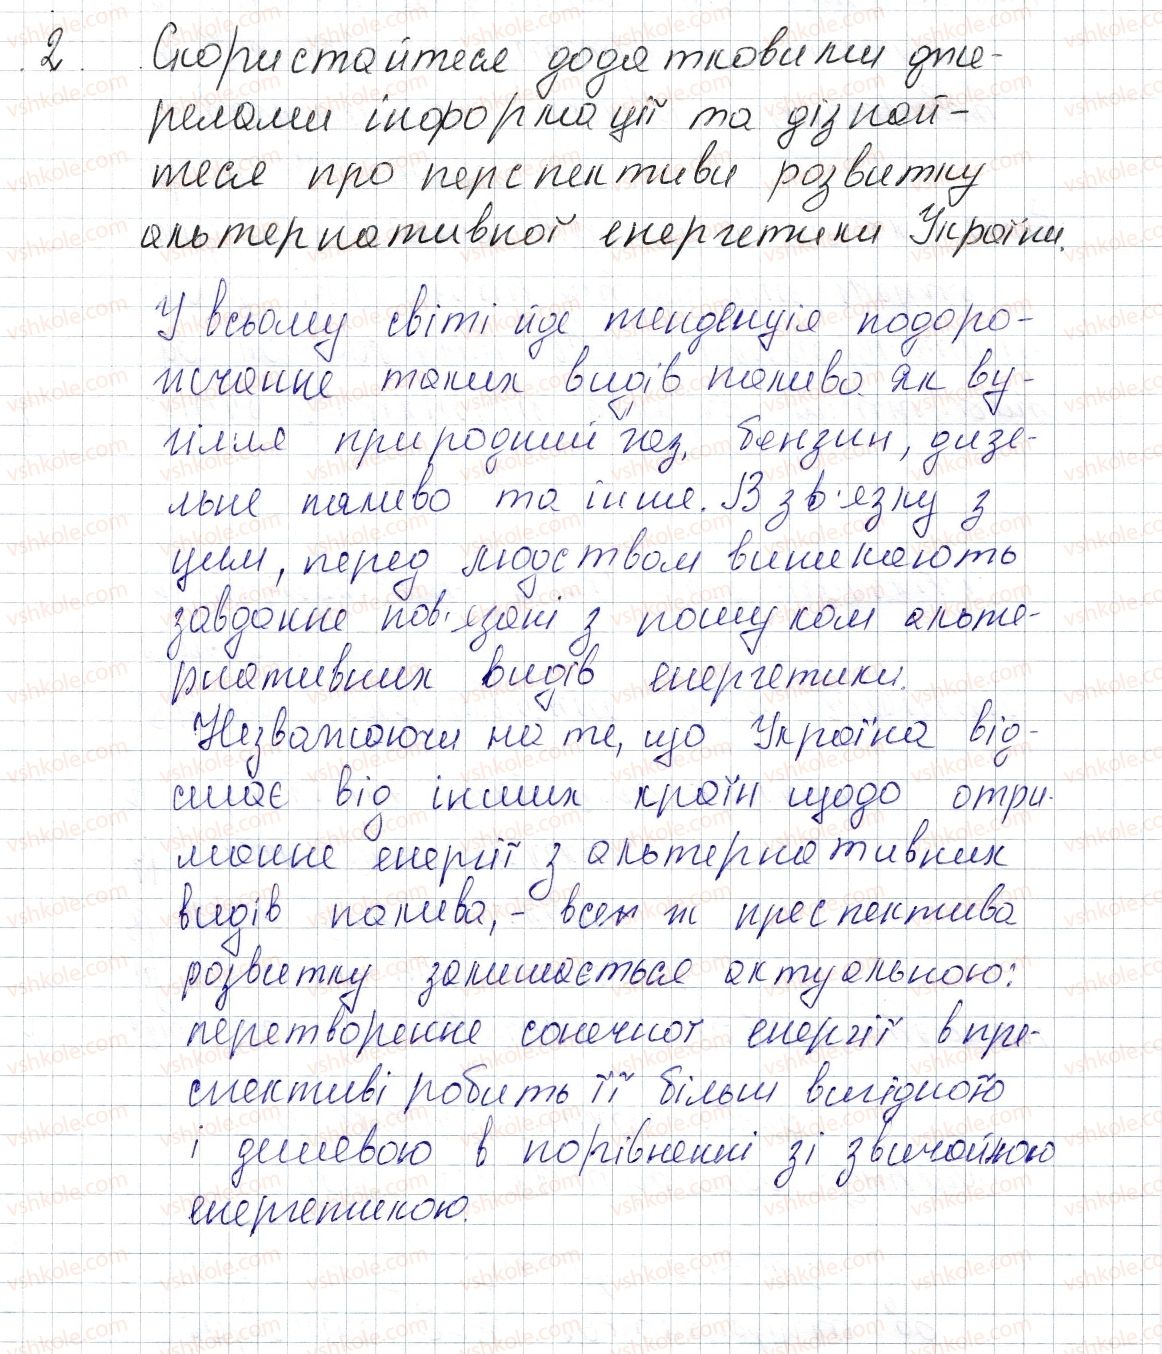 8-fizika-vg-baryahtar-fya-bozhinova-so-dovgij-oo-kiryuhina-2016--vpravi-18-2.jpg